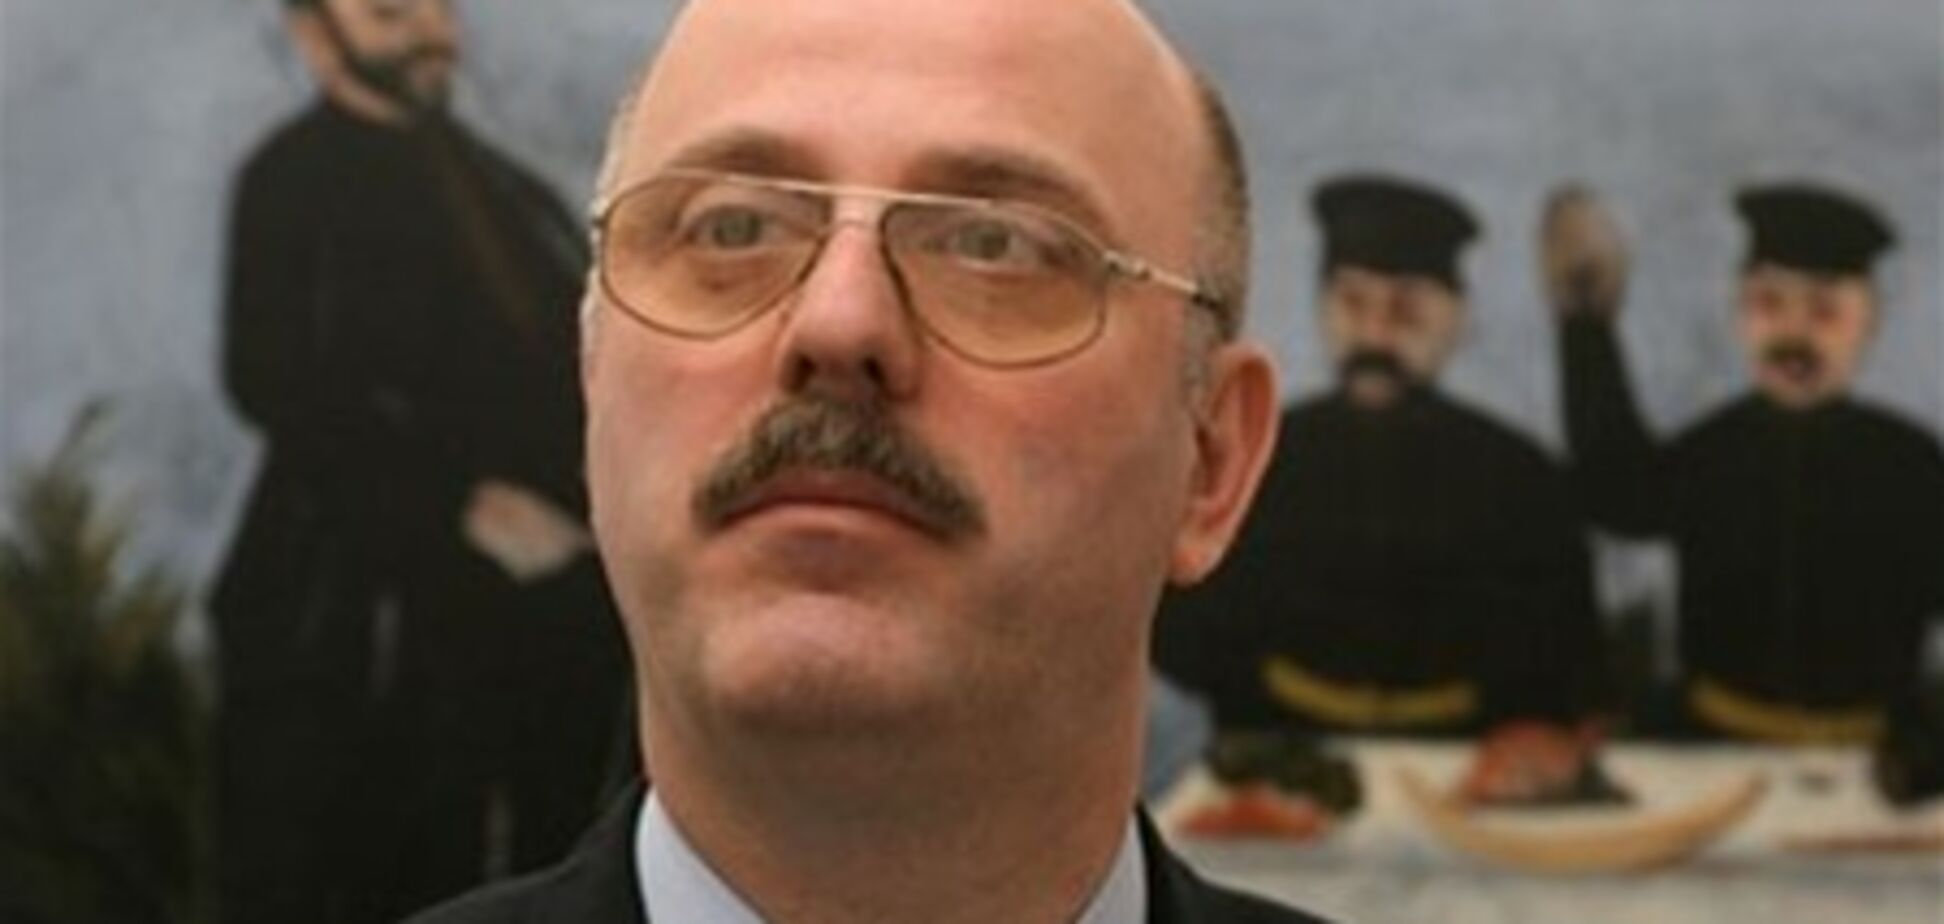 Вперше зміна влади в Грузії пройшла мирним шляхом - Катамадзе